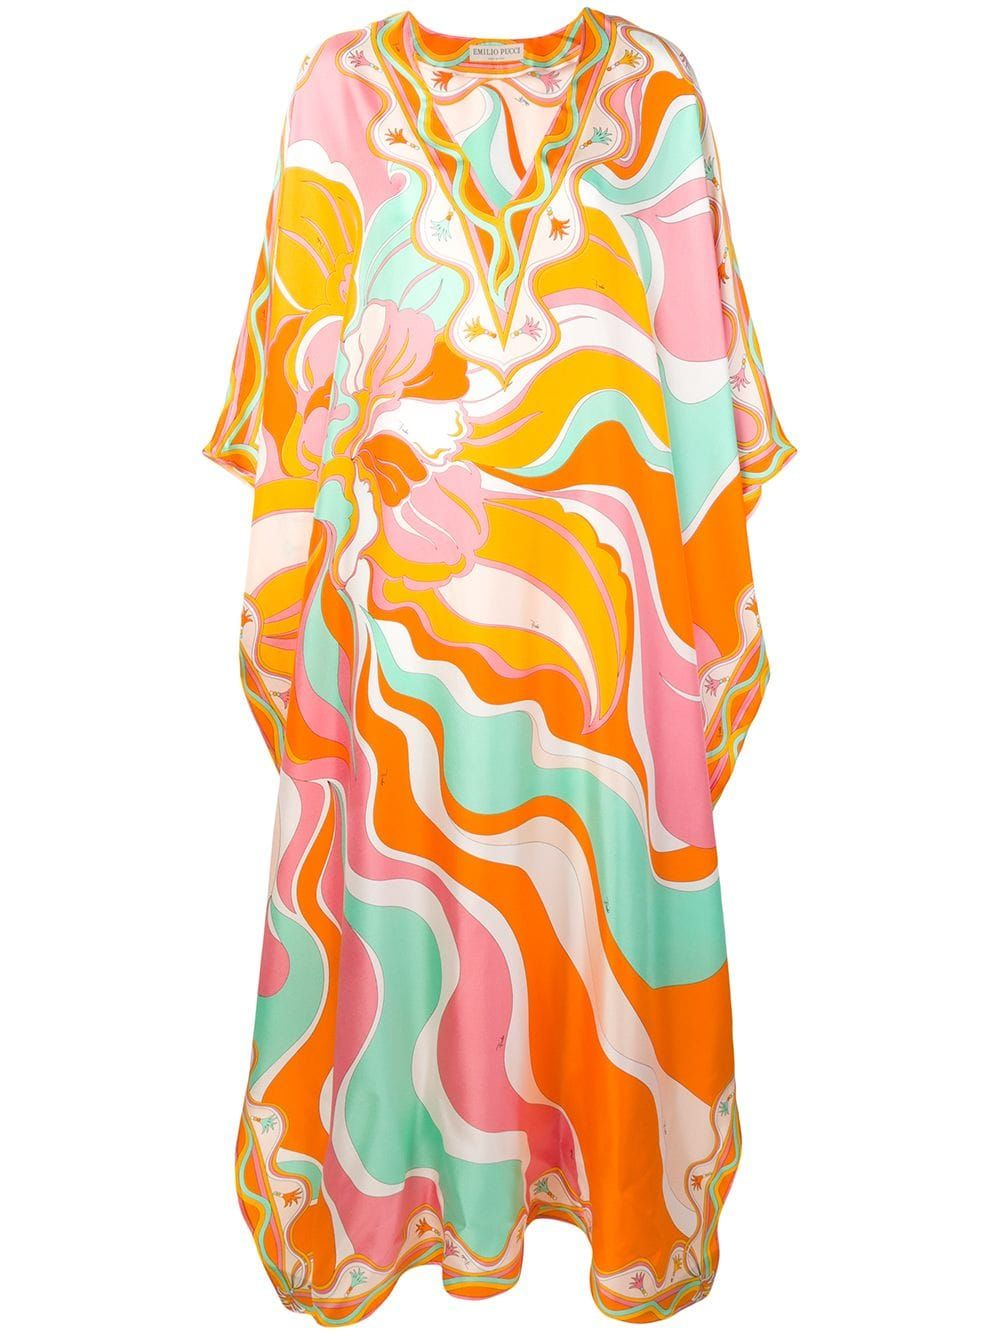 Beach Dress White and Pink Emilio Pucci Printed Dress 100/% Silk